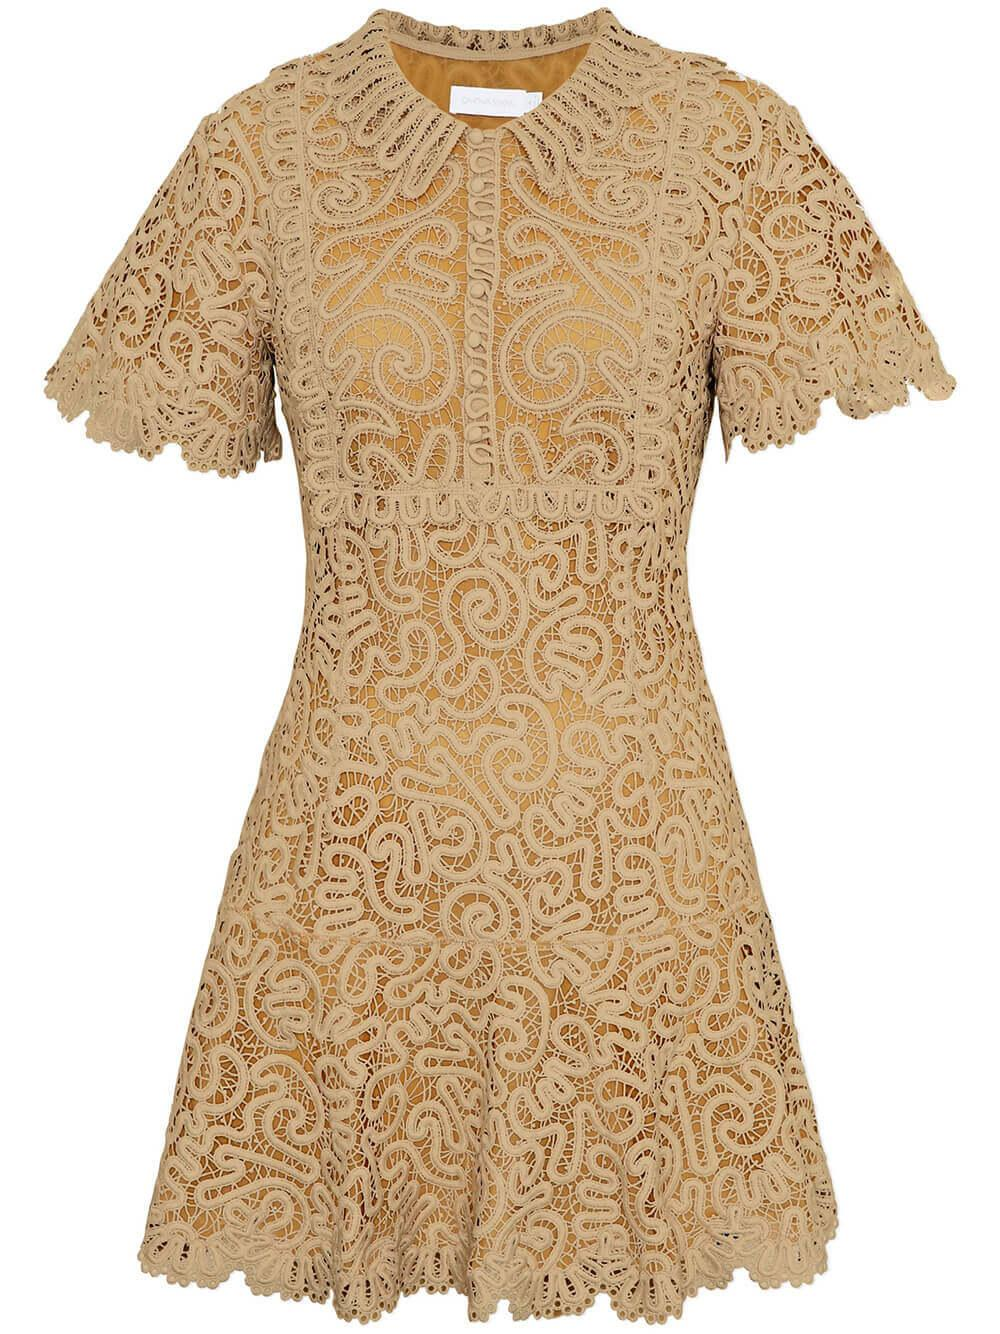 Cheyenne Guipure Flutter Sleeve Dress Item # 521-1063-G